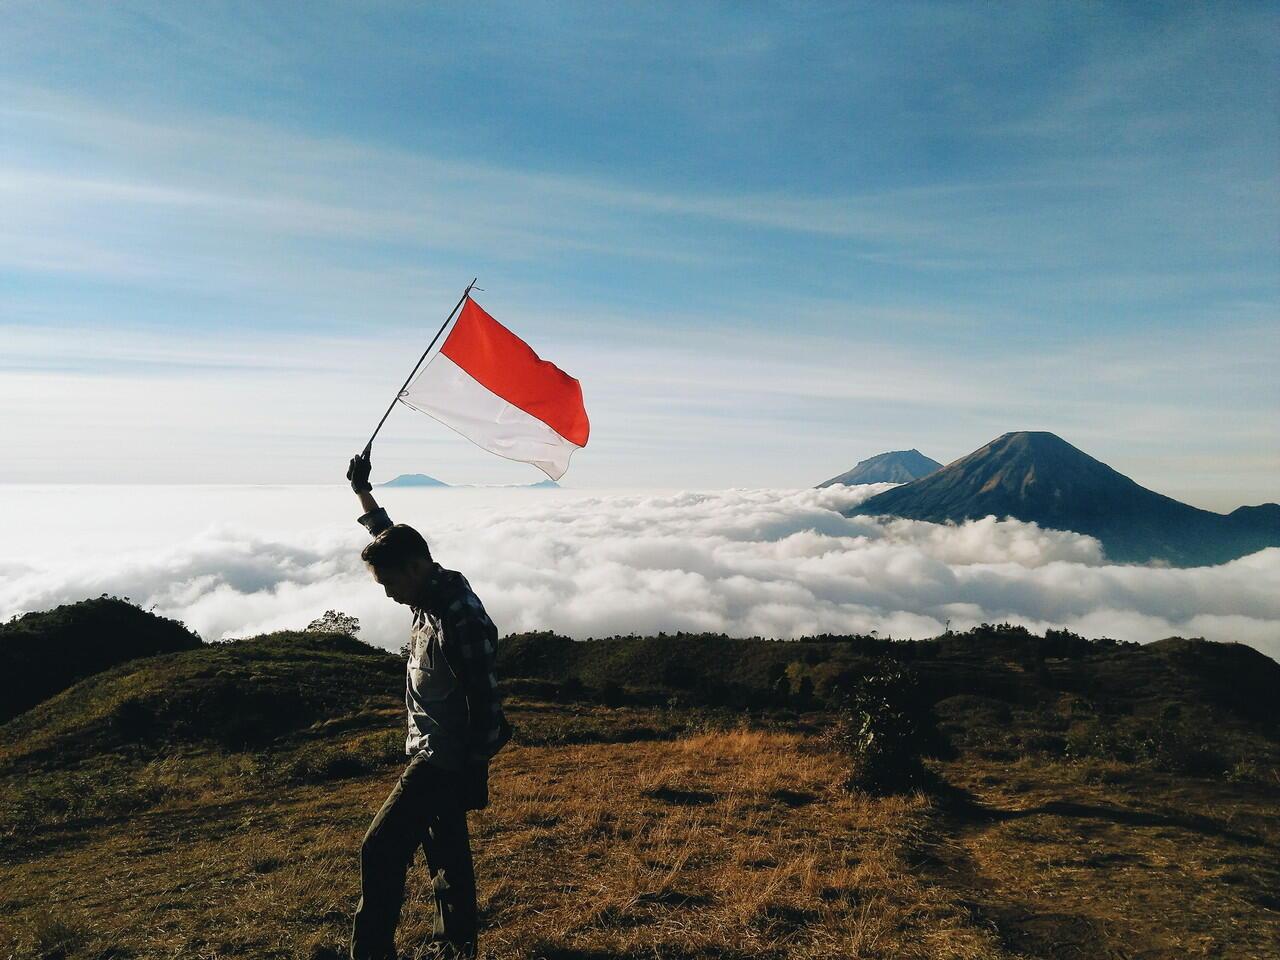 Pendakian Gunung Prau via Igirmranak, rekomendasi jalur sepi.